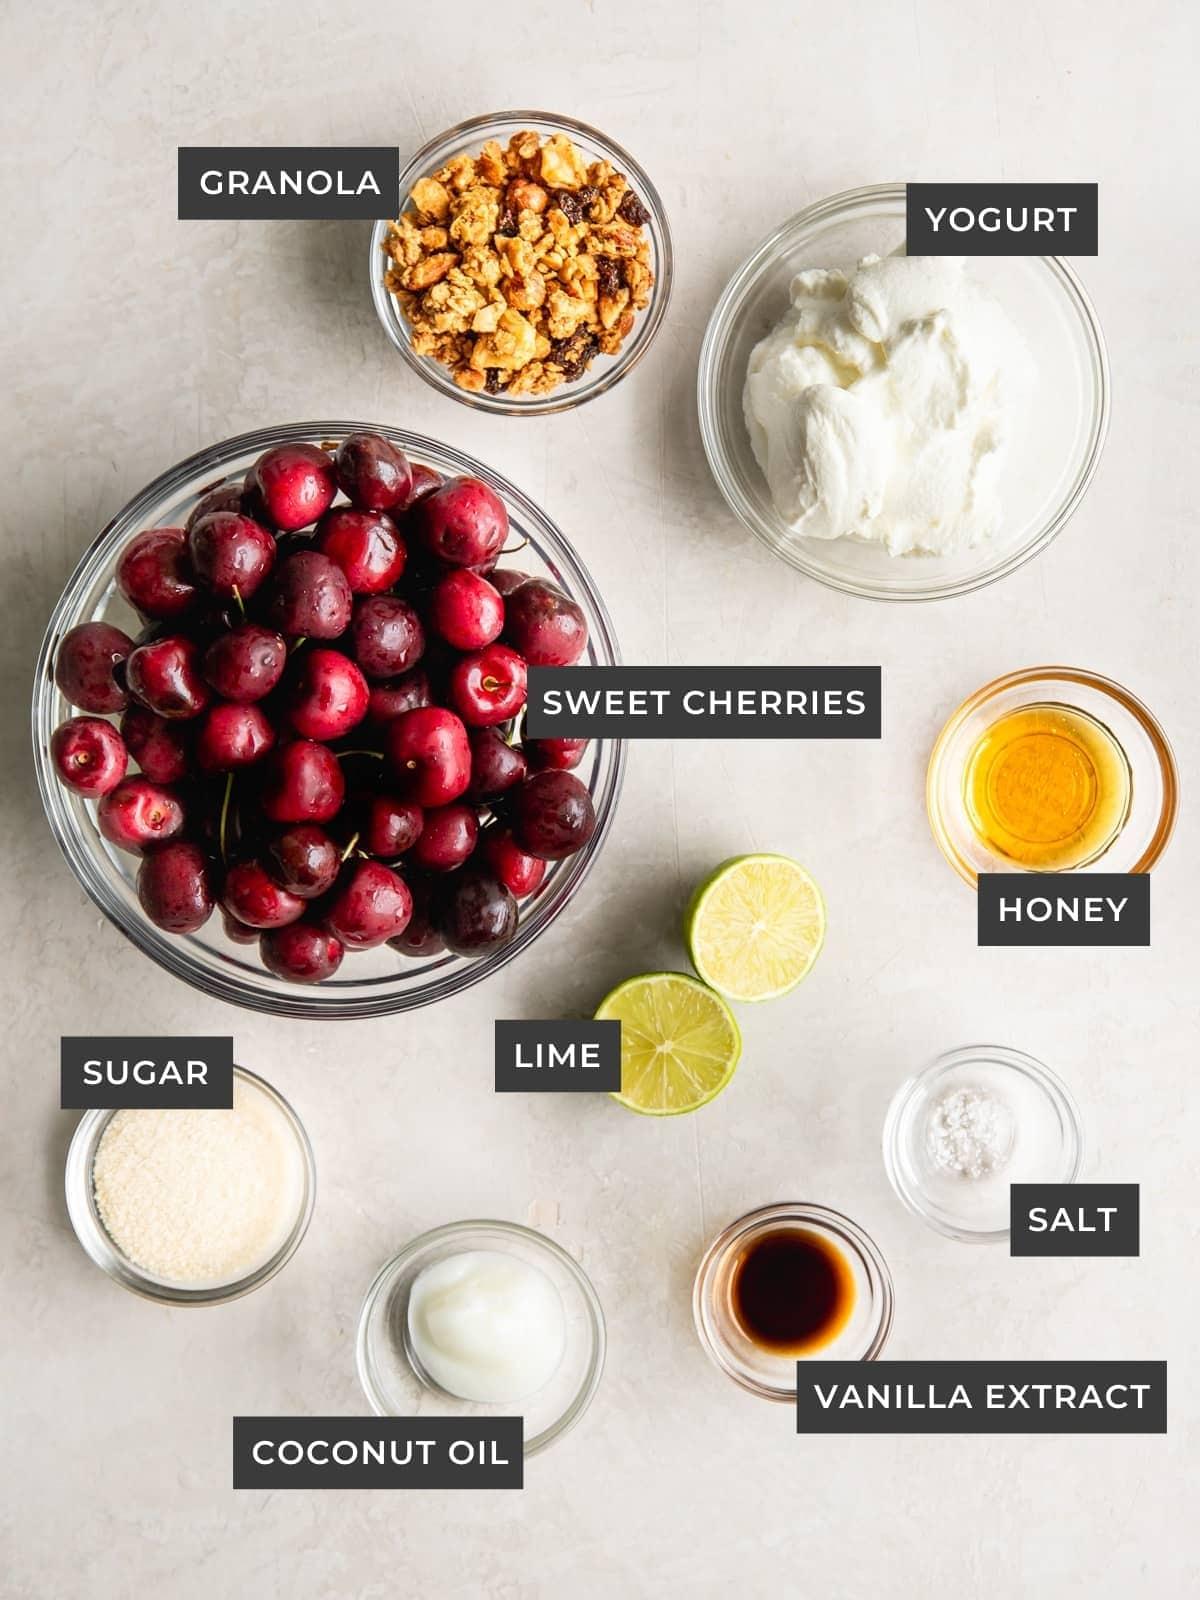 Ingredients of bowl, including cherries, granola, yogurt, honey, lime, salt, vanilla, oil, and sugar.